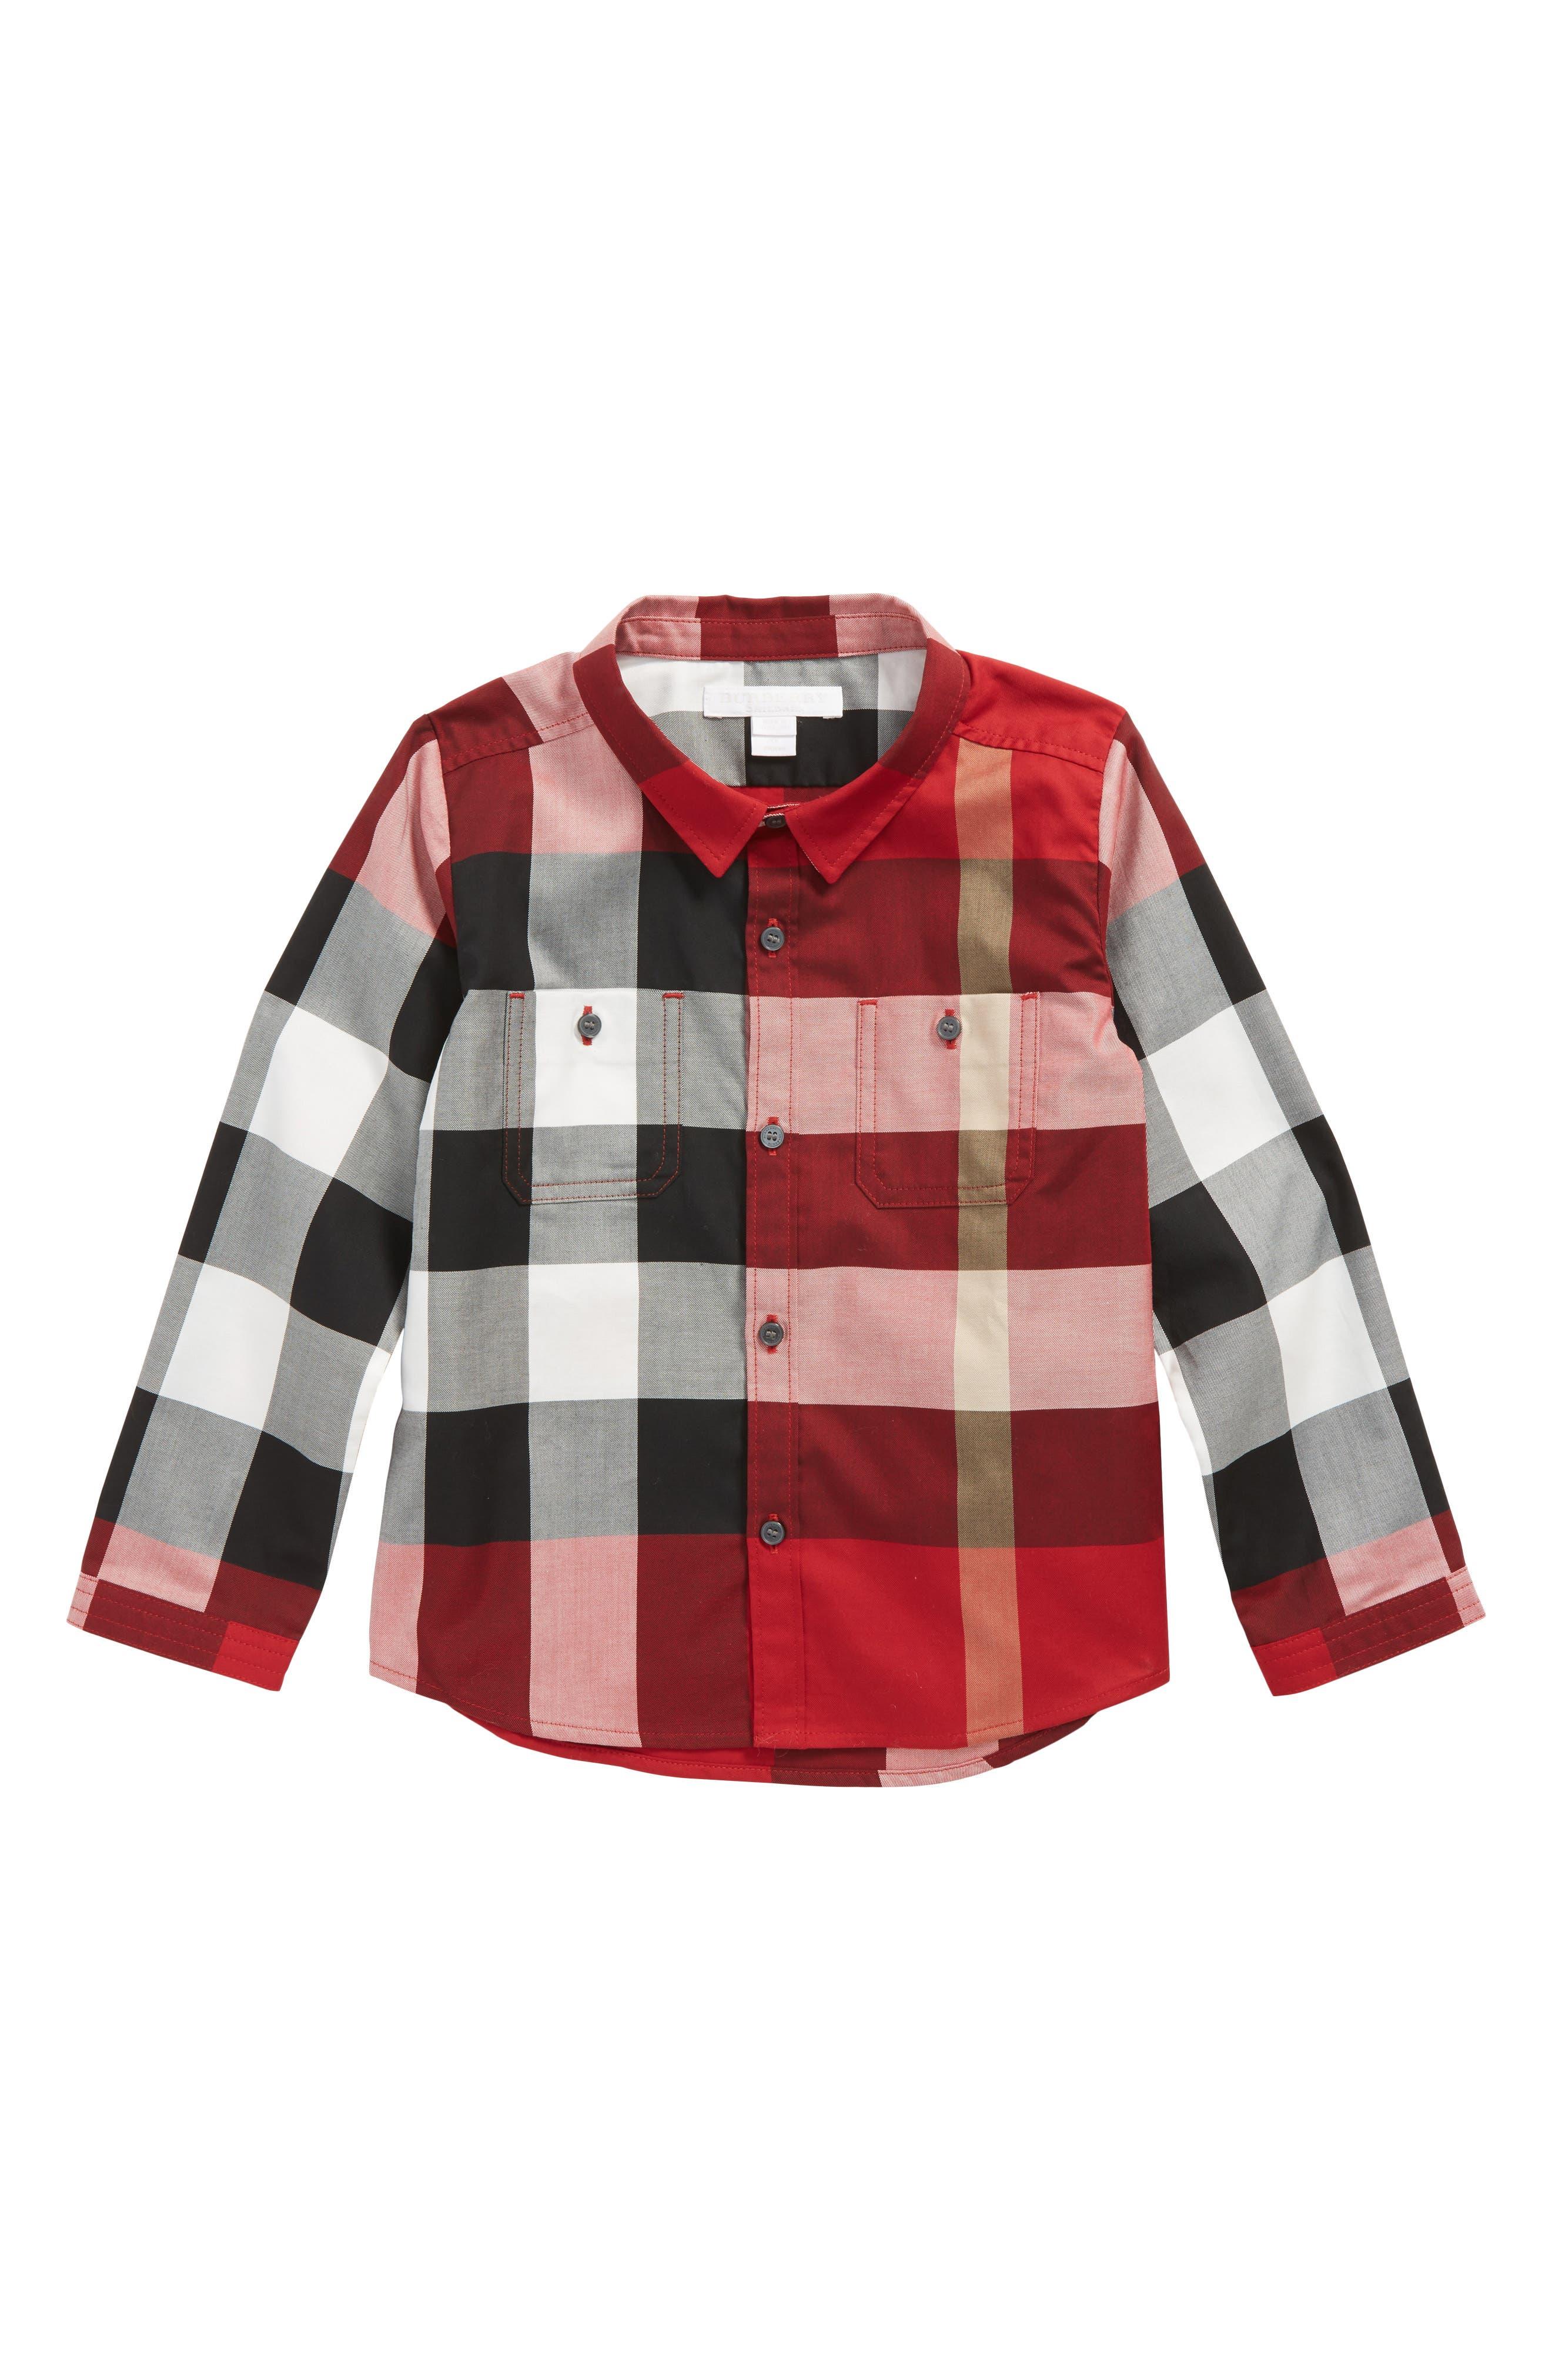 Alternate Image 1 Selected - Burberry Mini Camber Check Shirt (Toddler Boys)